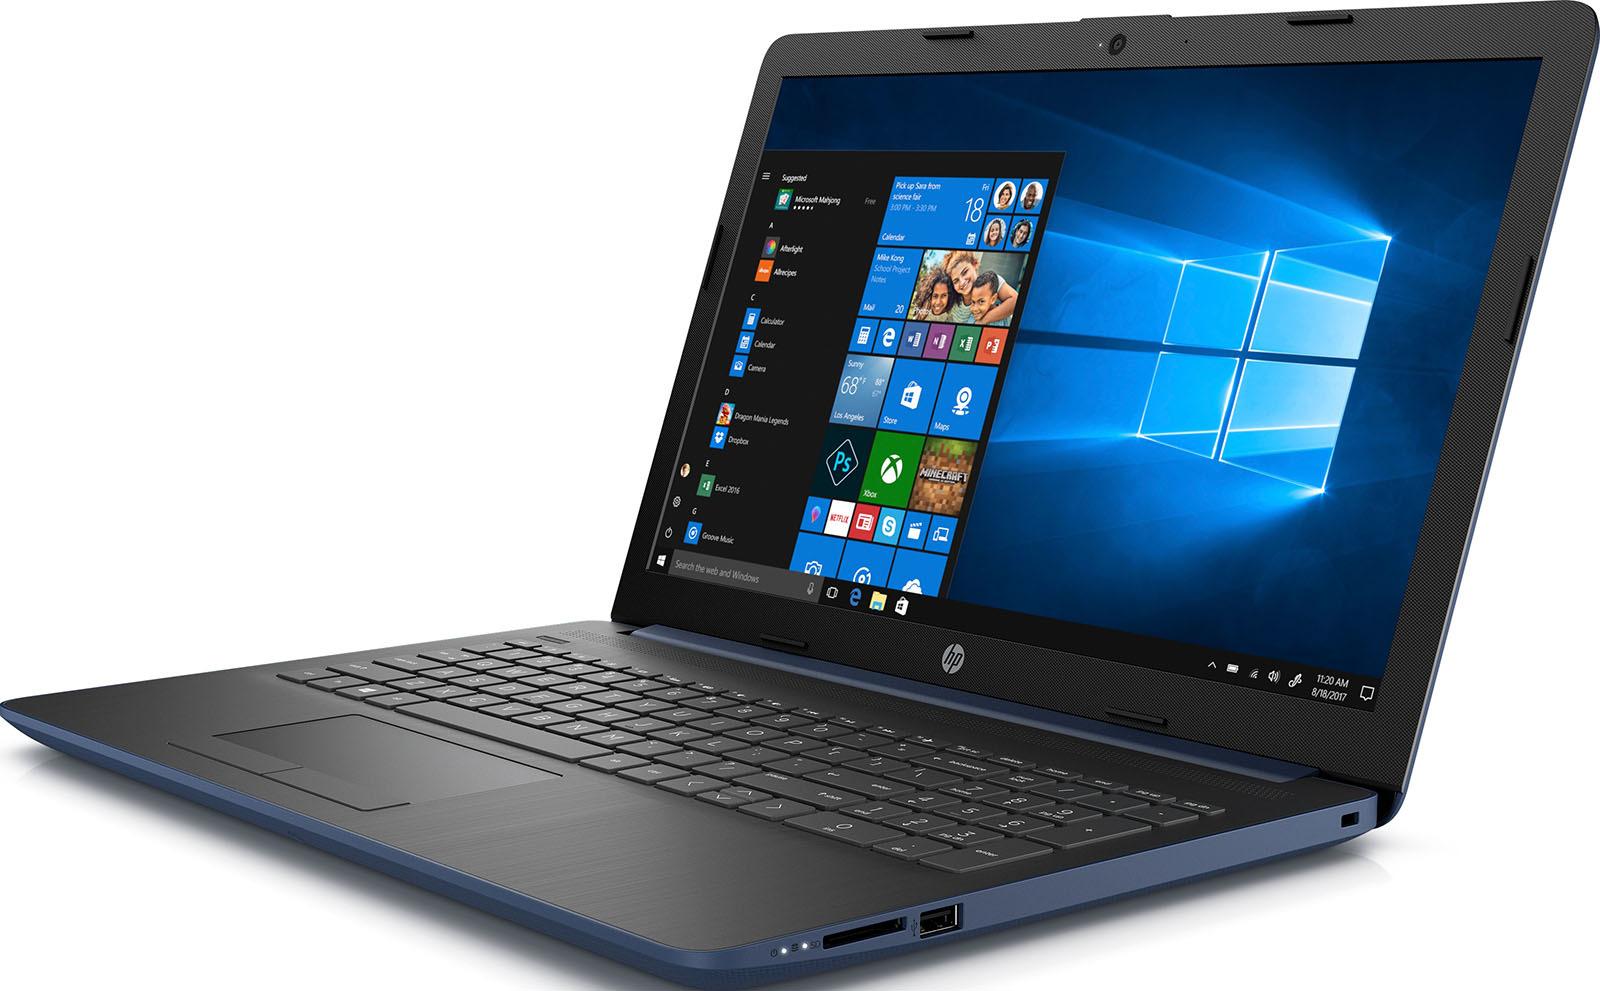 15.6 Ноутбук HP 15-da0058ur 4JR08EA, синий ноутбук синий